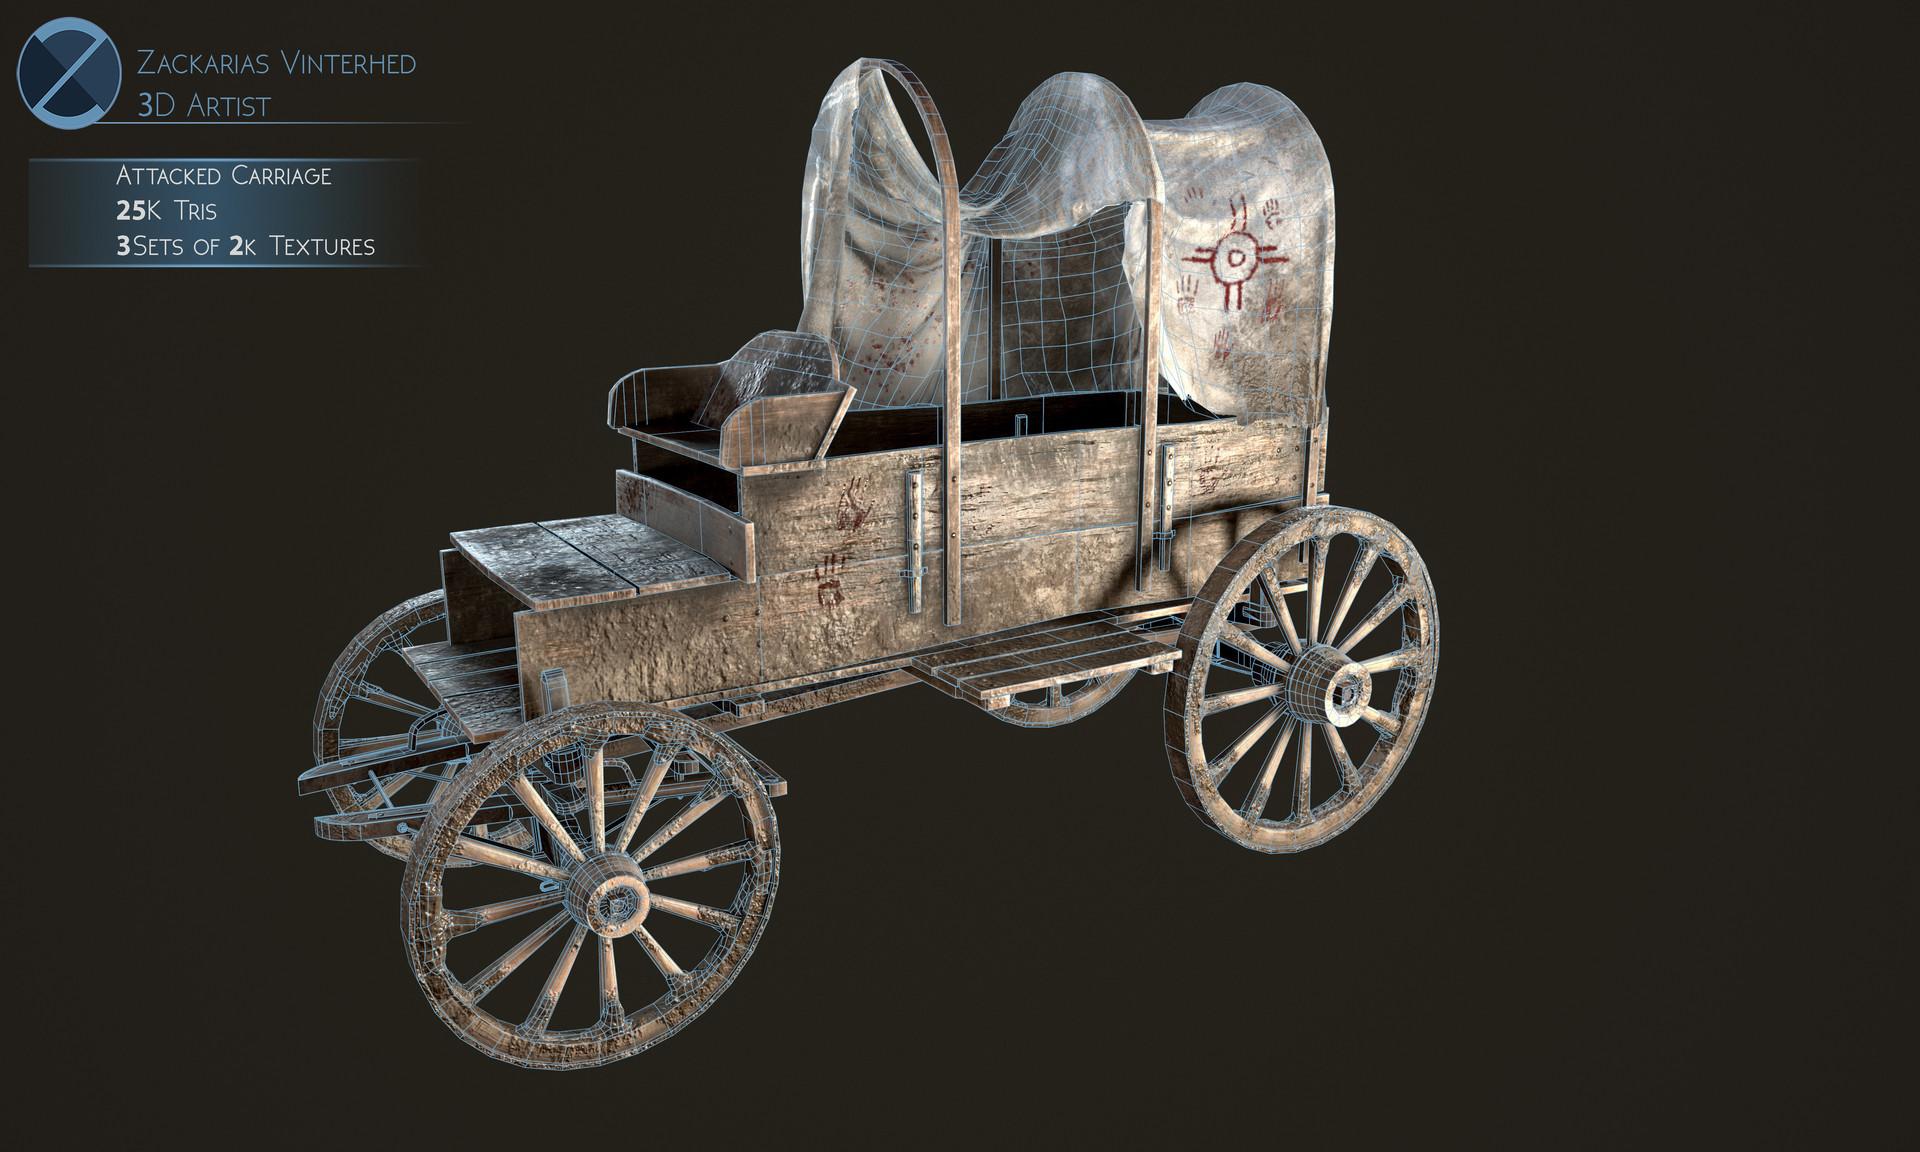 Zackarias vinterhed carriage 07